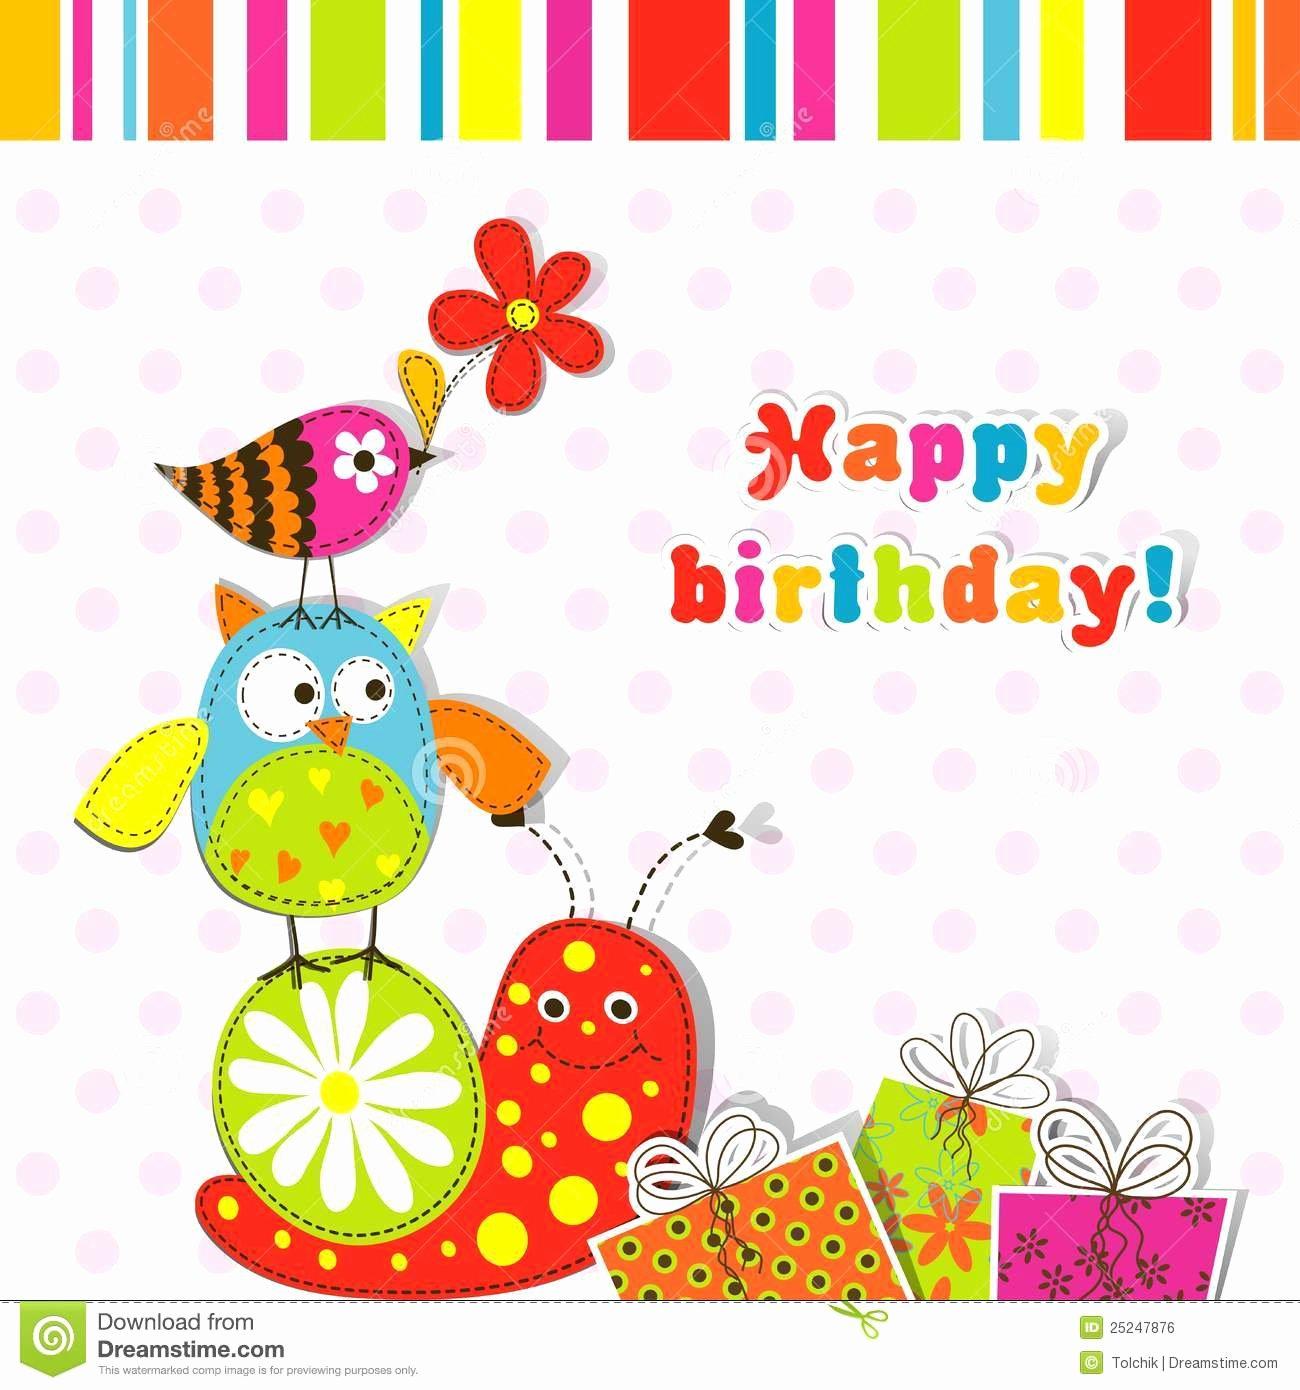 Happy Birthday Template Free Inspirational Birthday Card Template